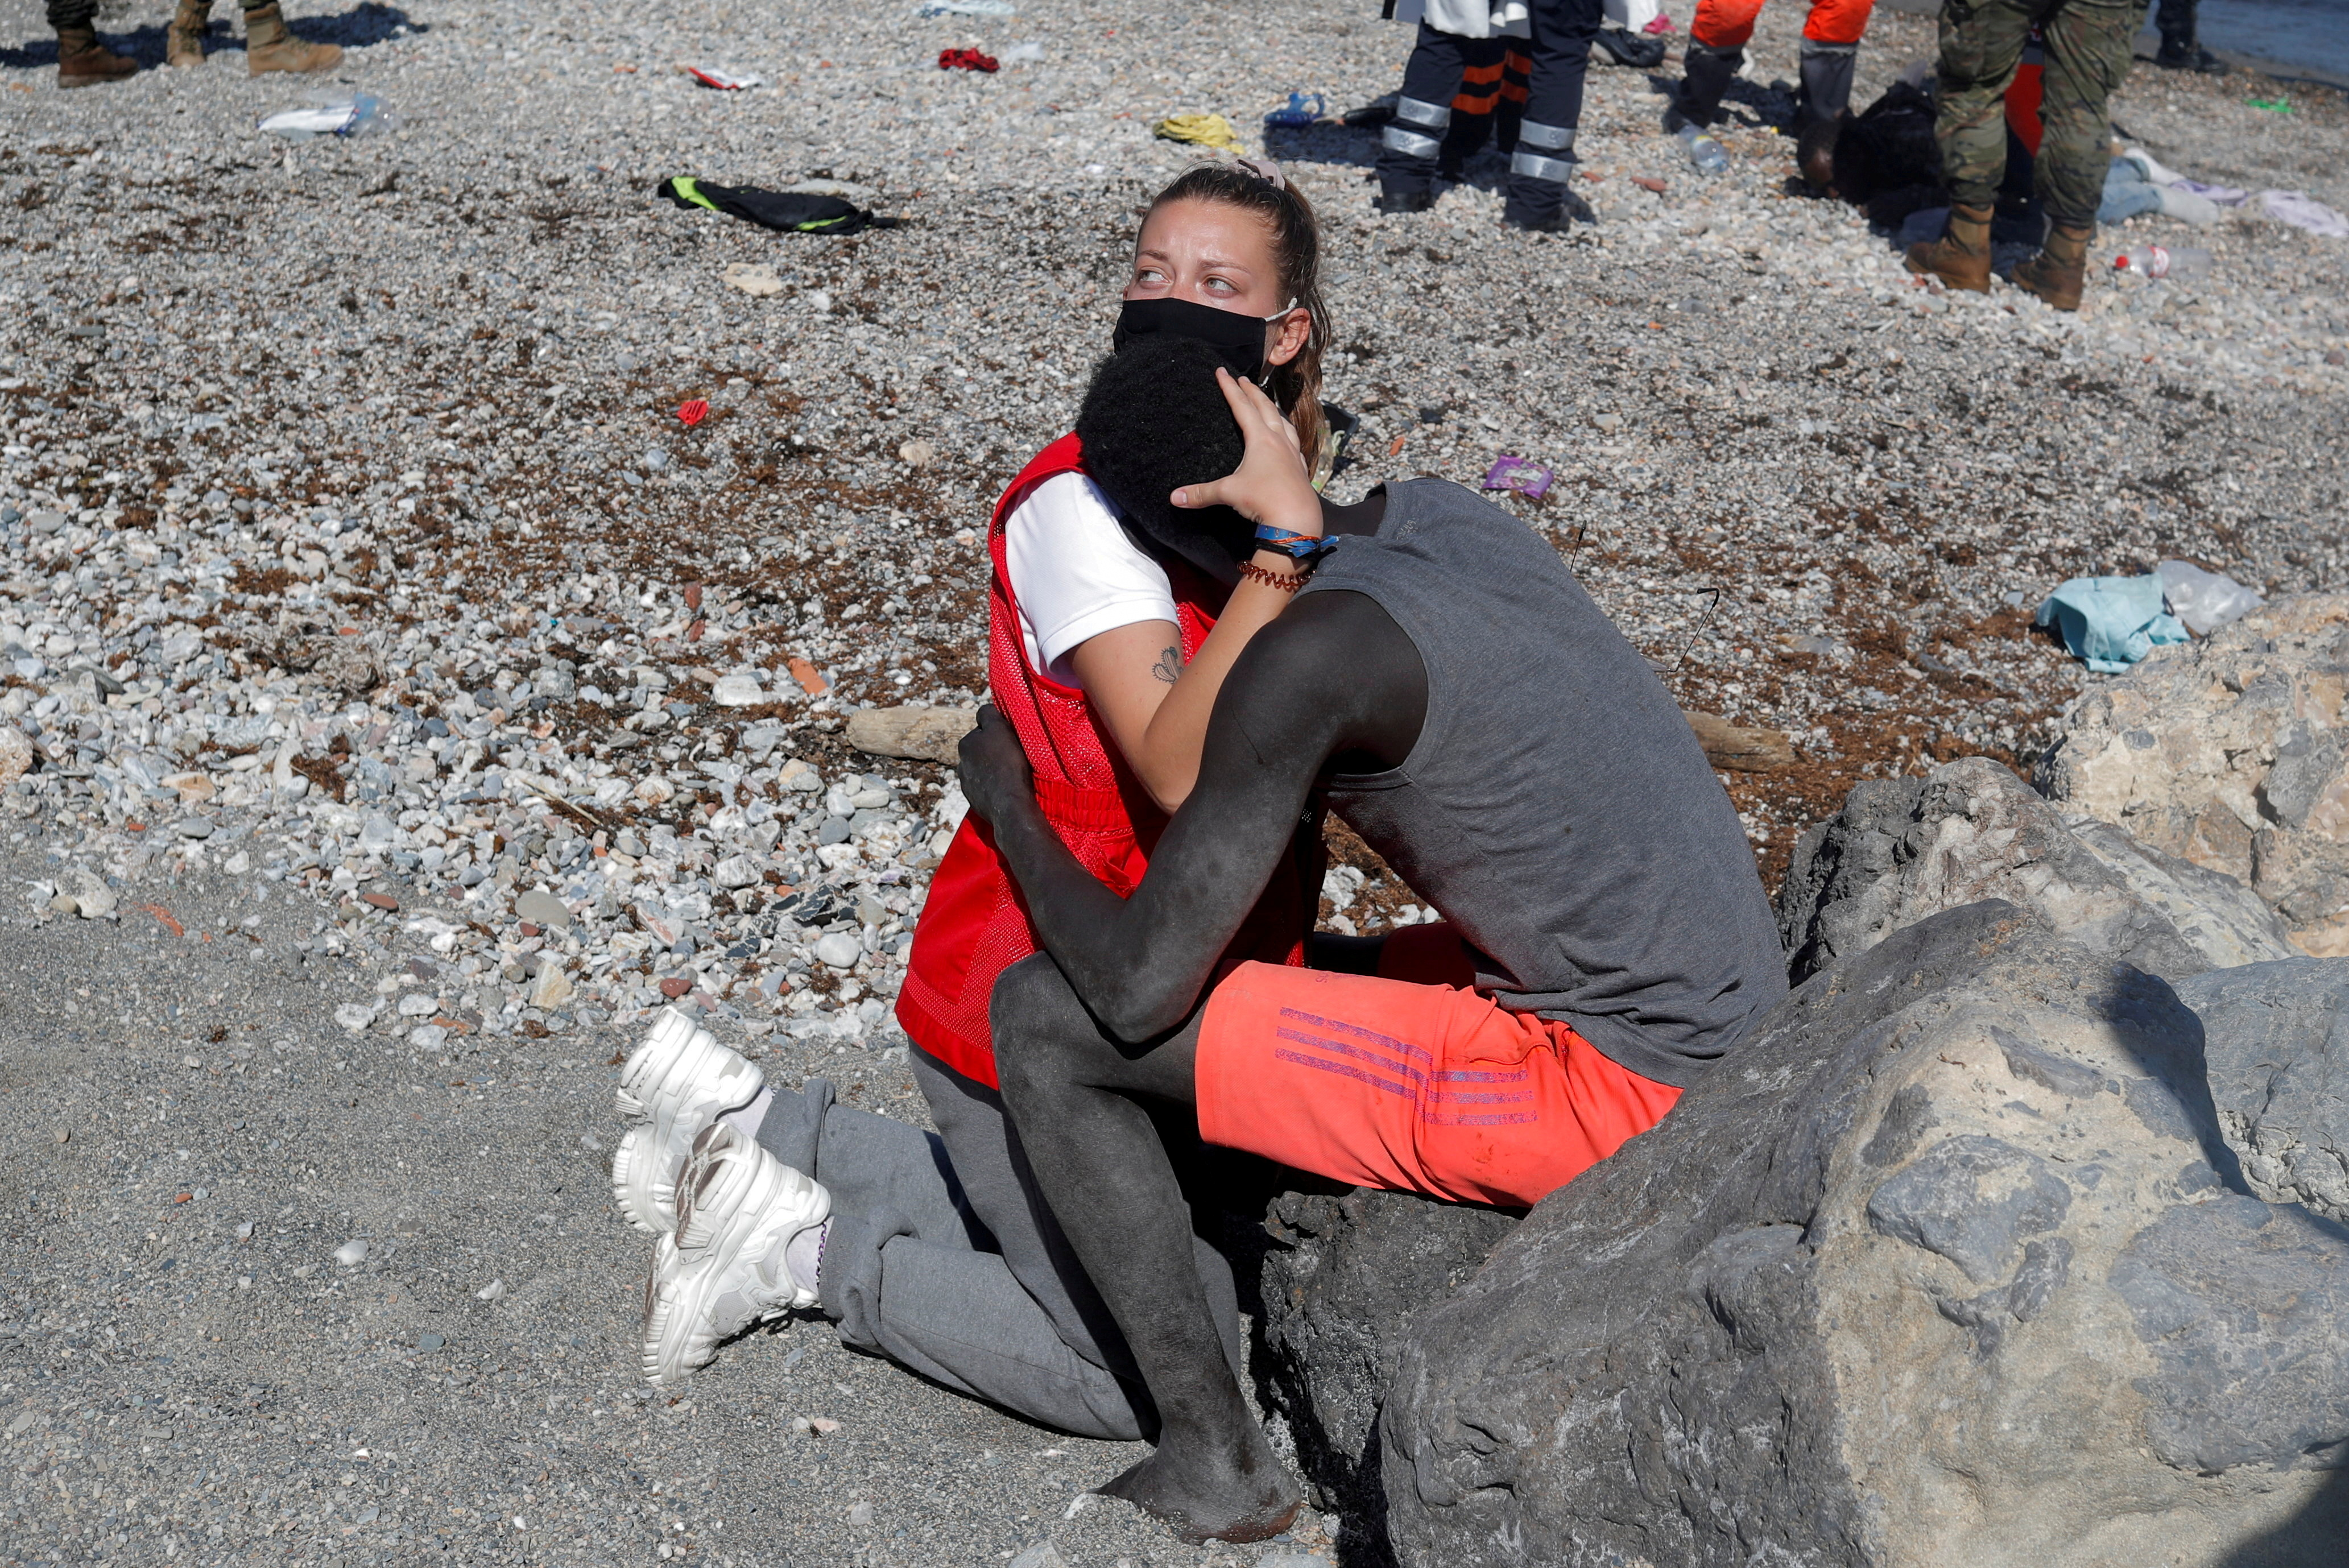 Morocco to readmit unaccompanied minors from EU